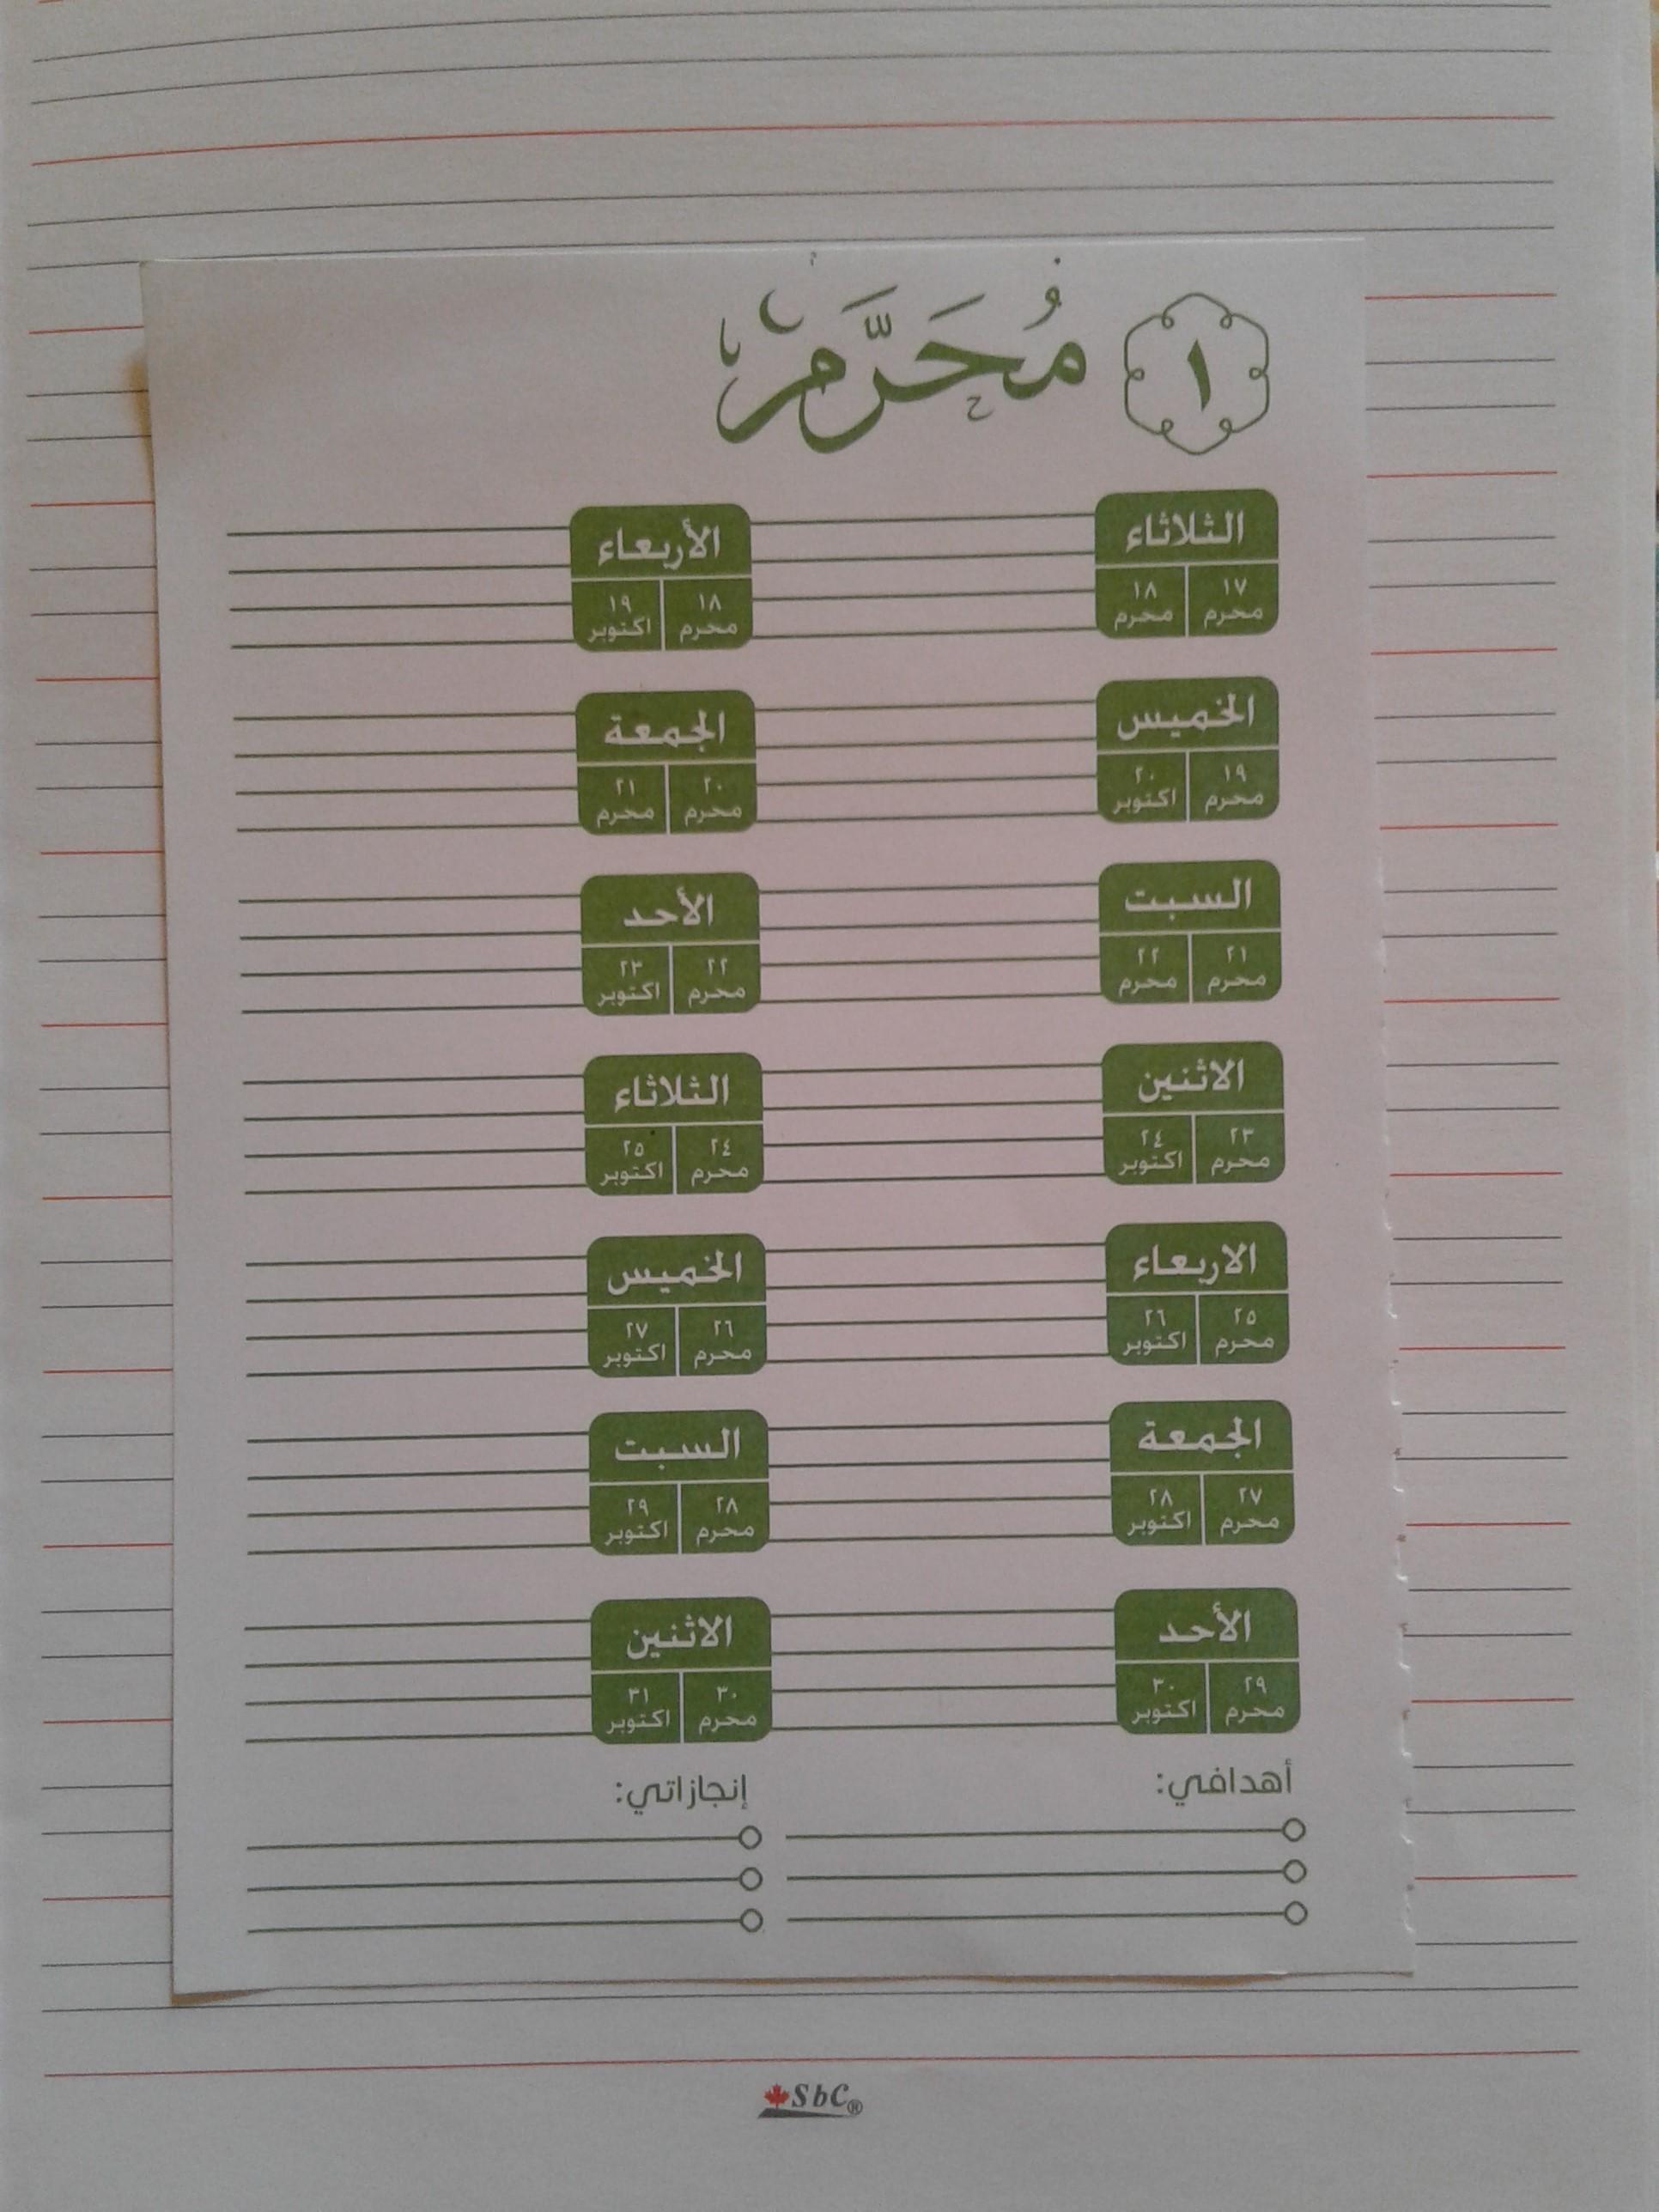 akhawat_islamway_1504360541___.jpg